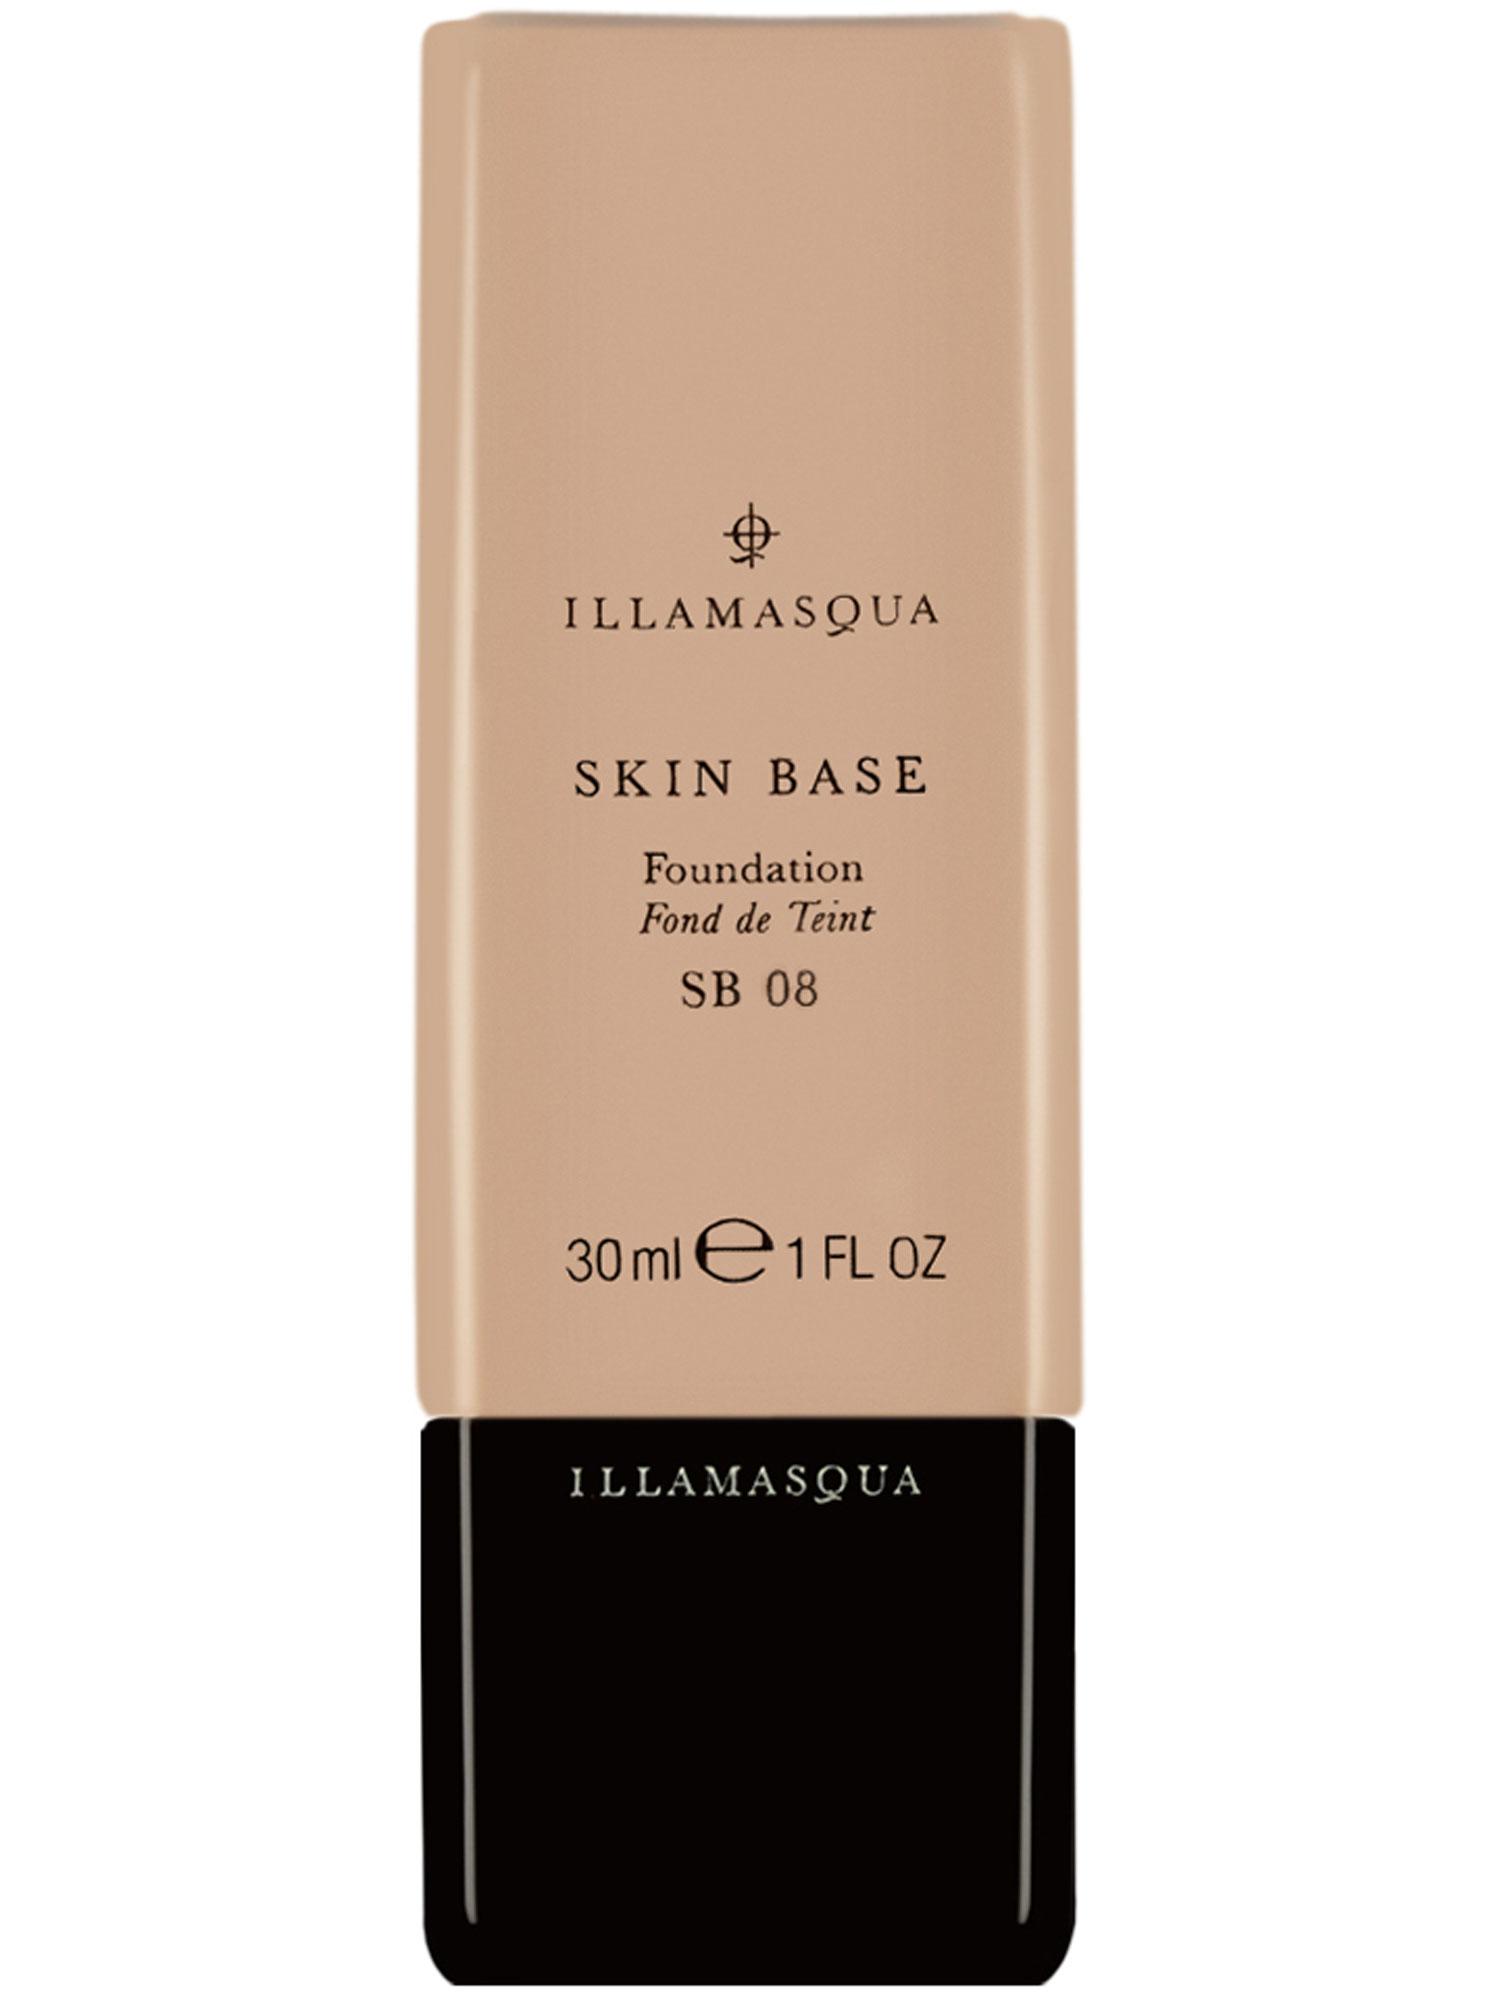 ILLAMASQUA-Skin-Base-Foundation-30-ml-1-FL-OZ-43-NEW thumbnail 9